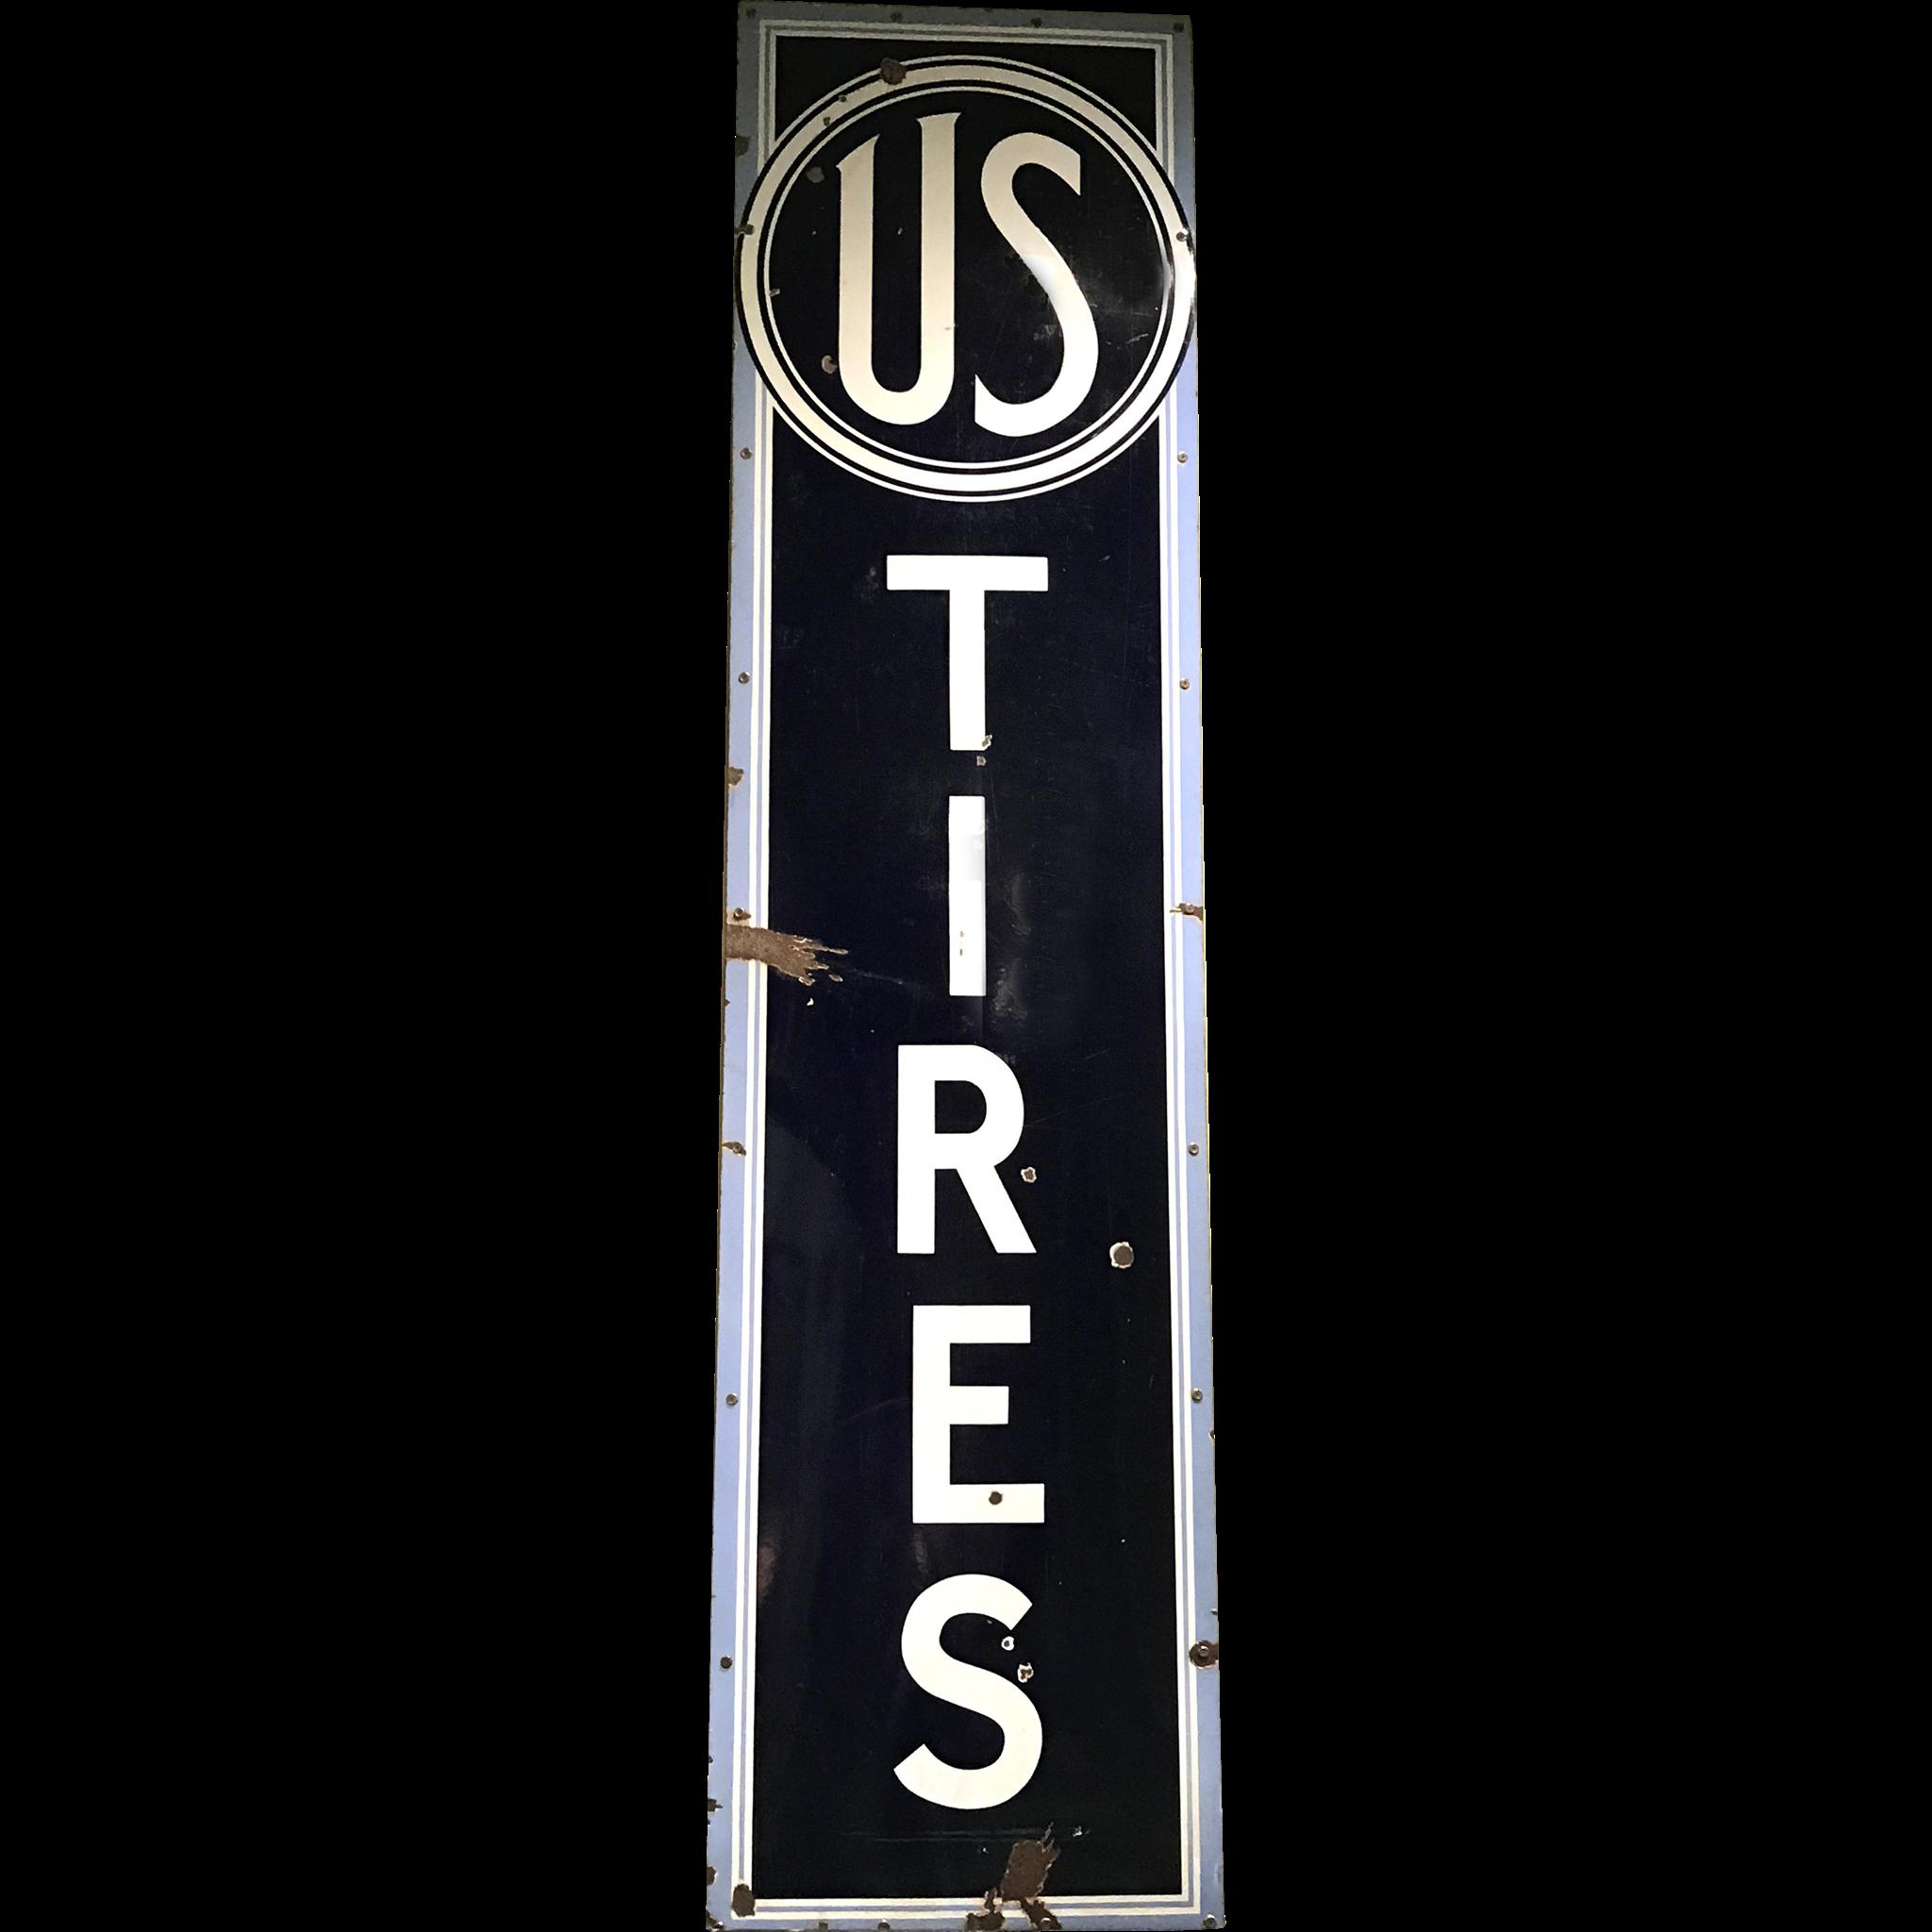 US Tires Vertical Enameled Porcelain Advertising Sign circa 1930